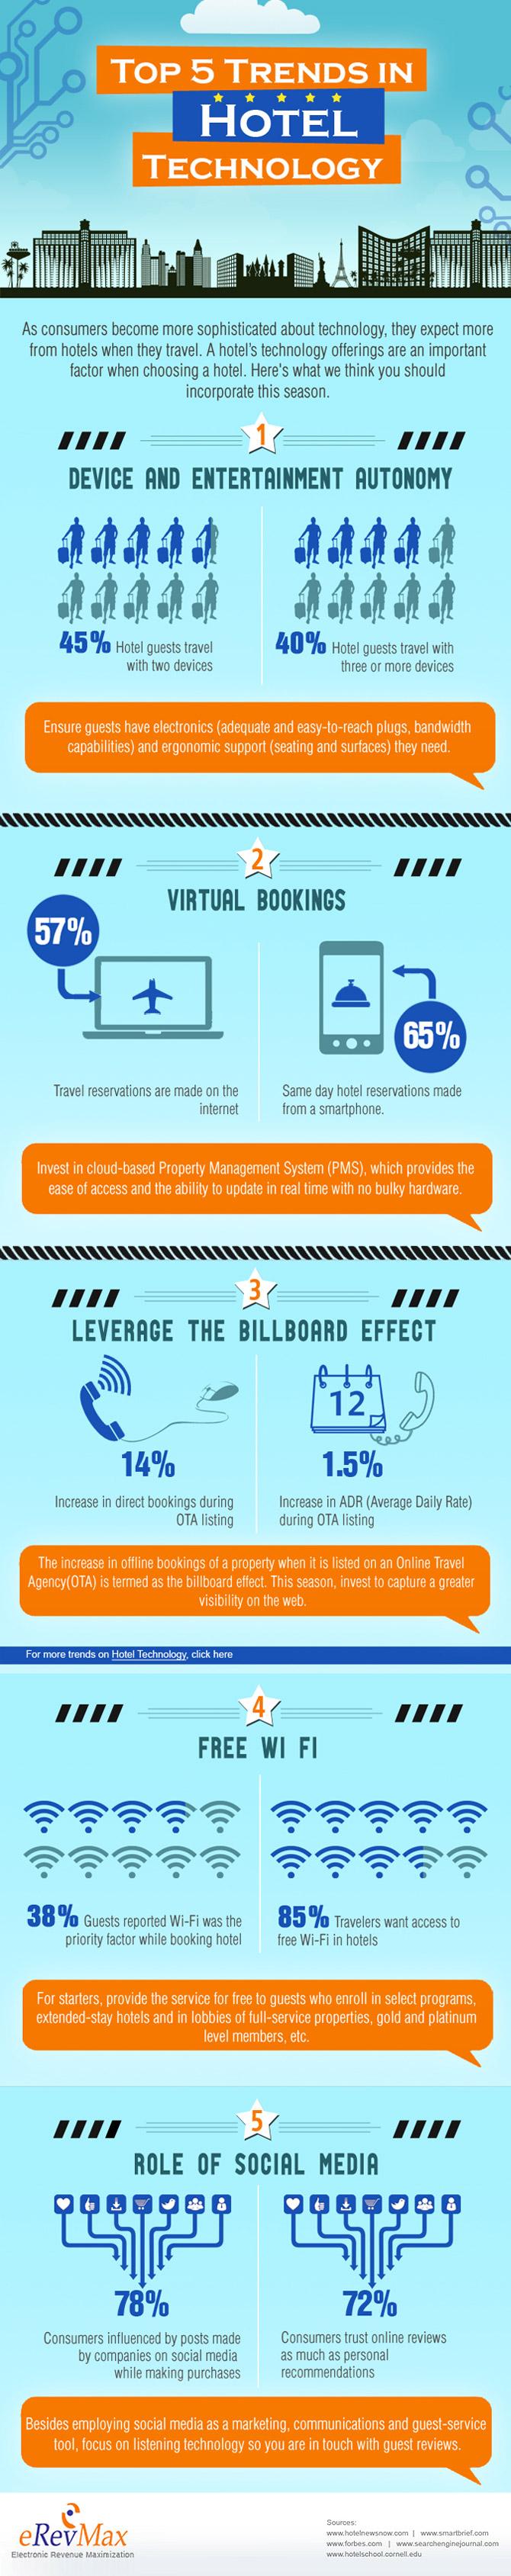 tendencias tecnológicas para hoteles